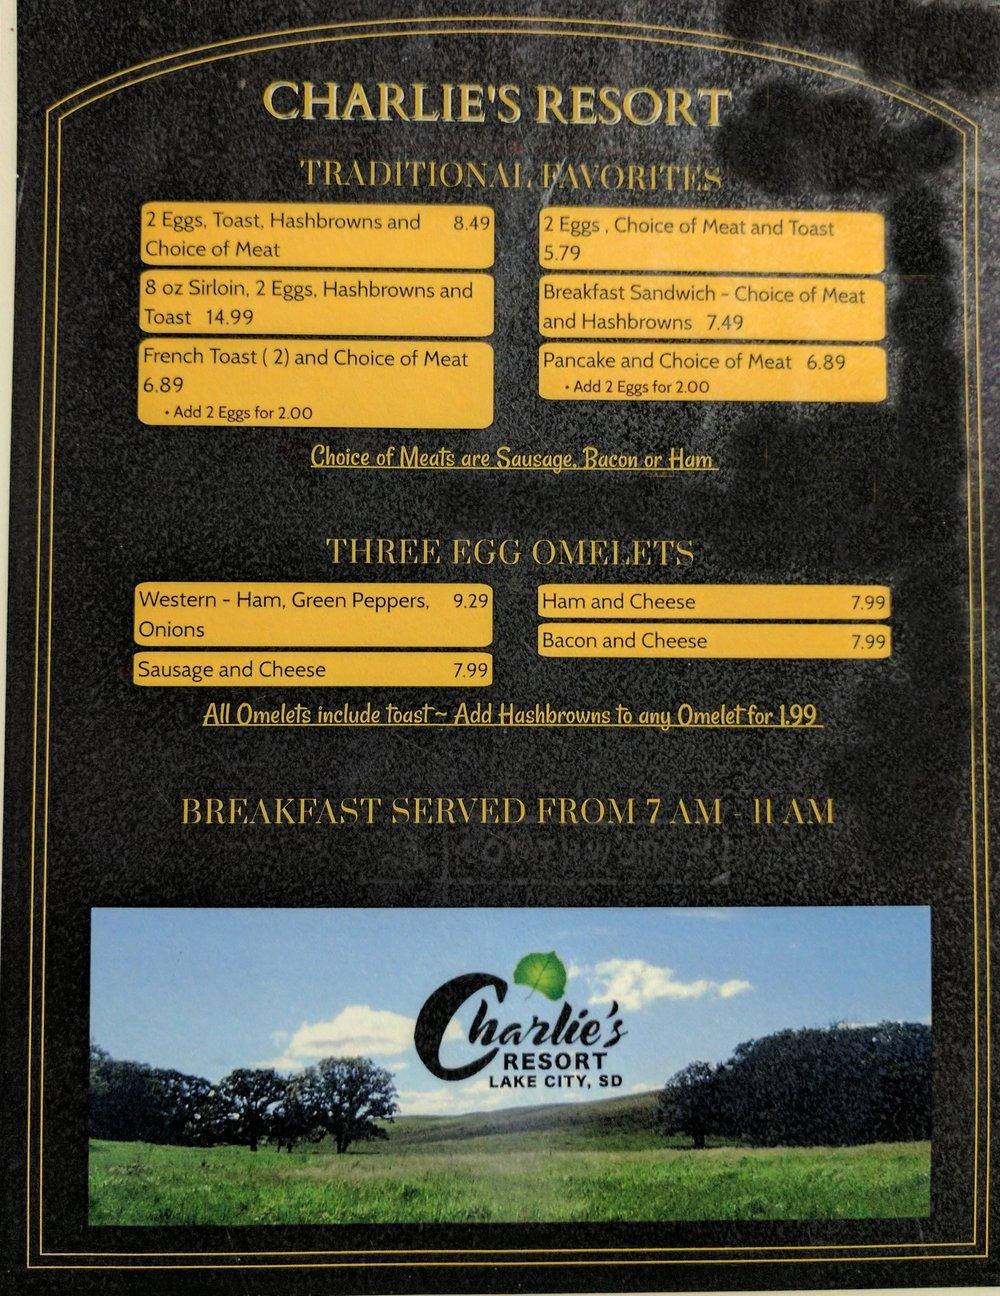 charlies resort menu 1.jpg